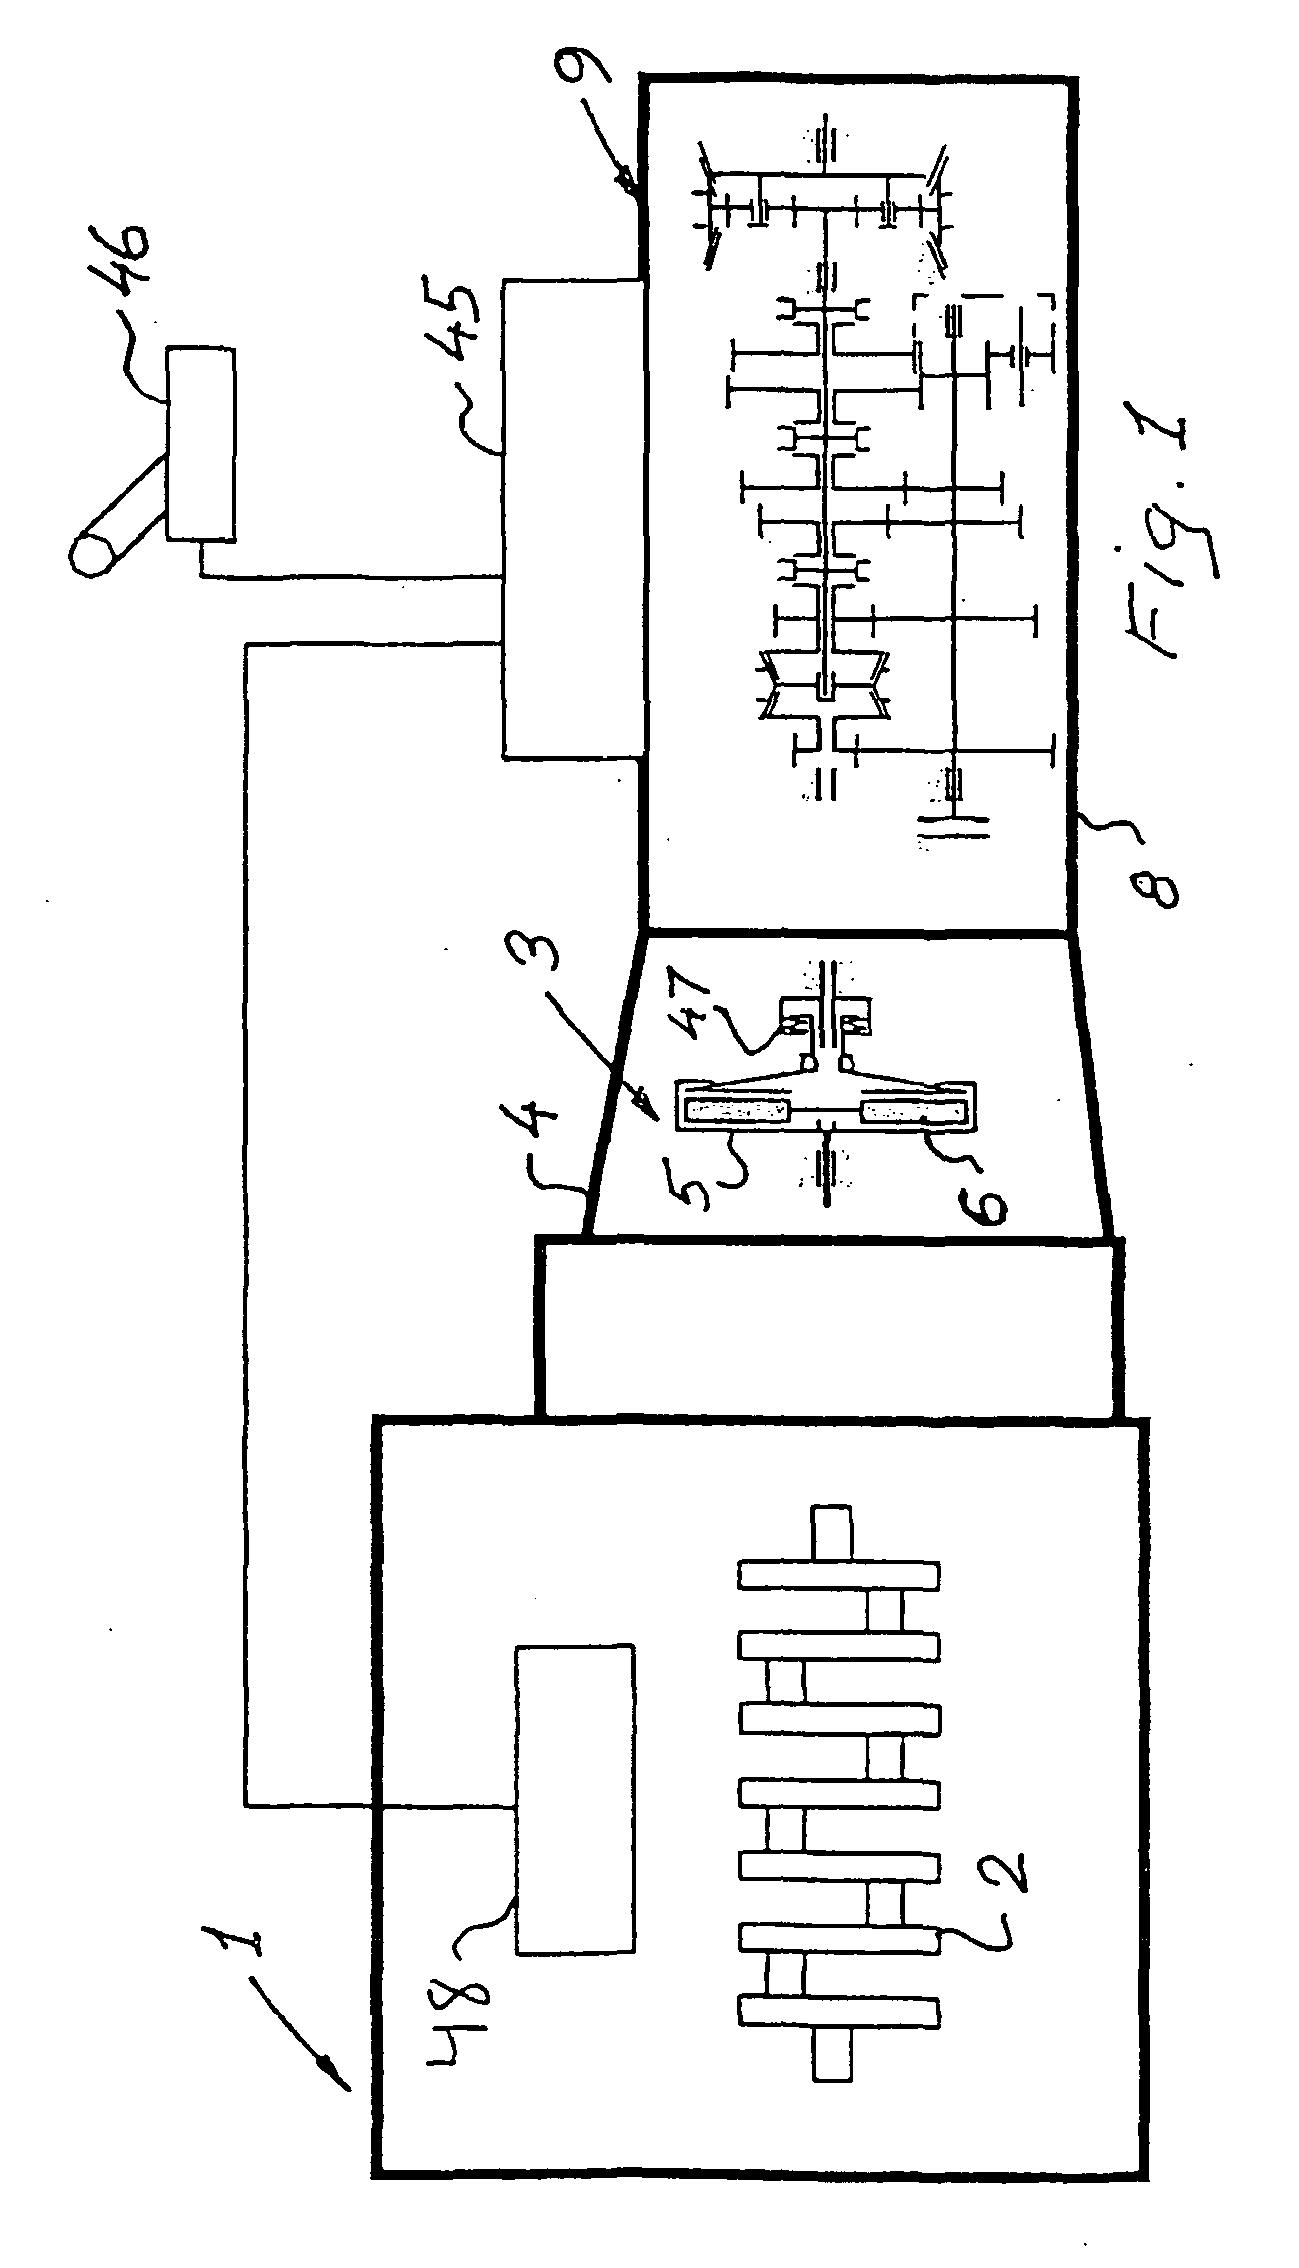 Patent EP1439975B1 - Kraftfahrzeug mit automatisiertem getriebe ...